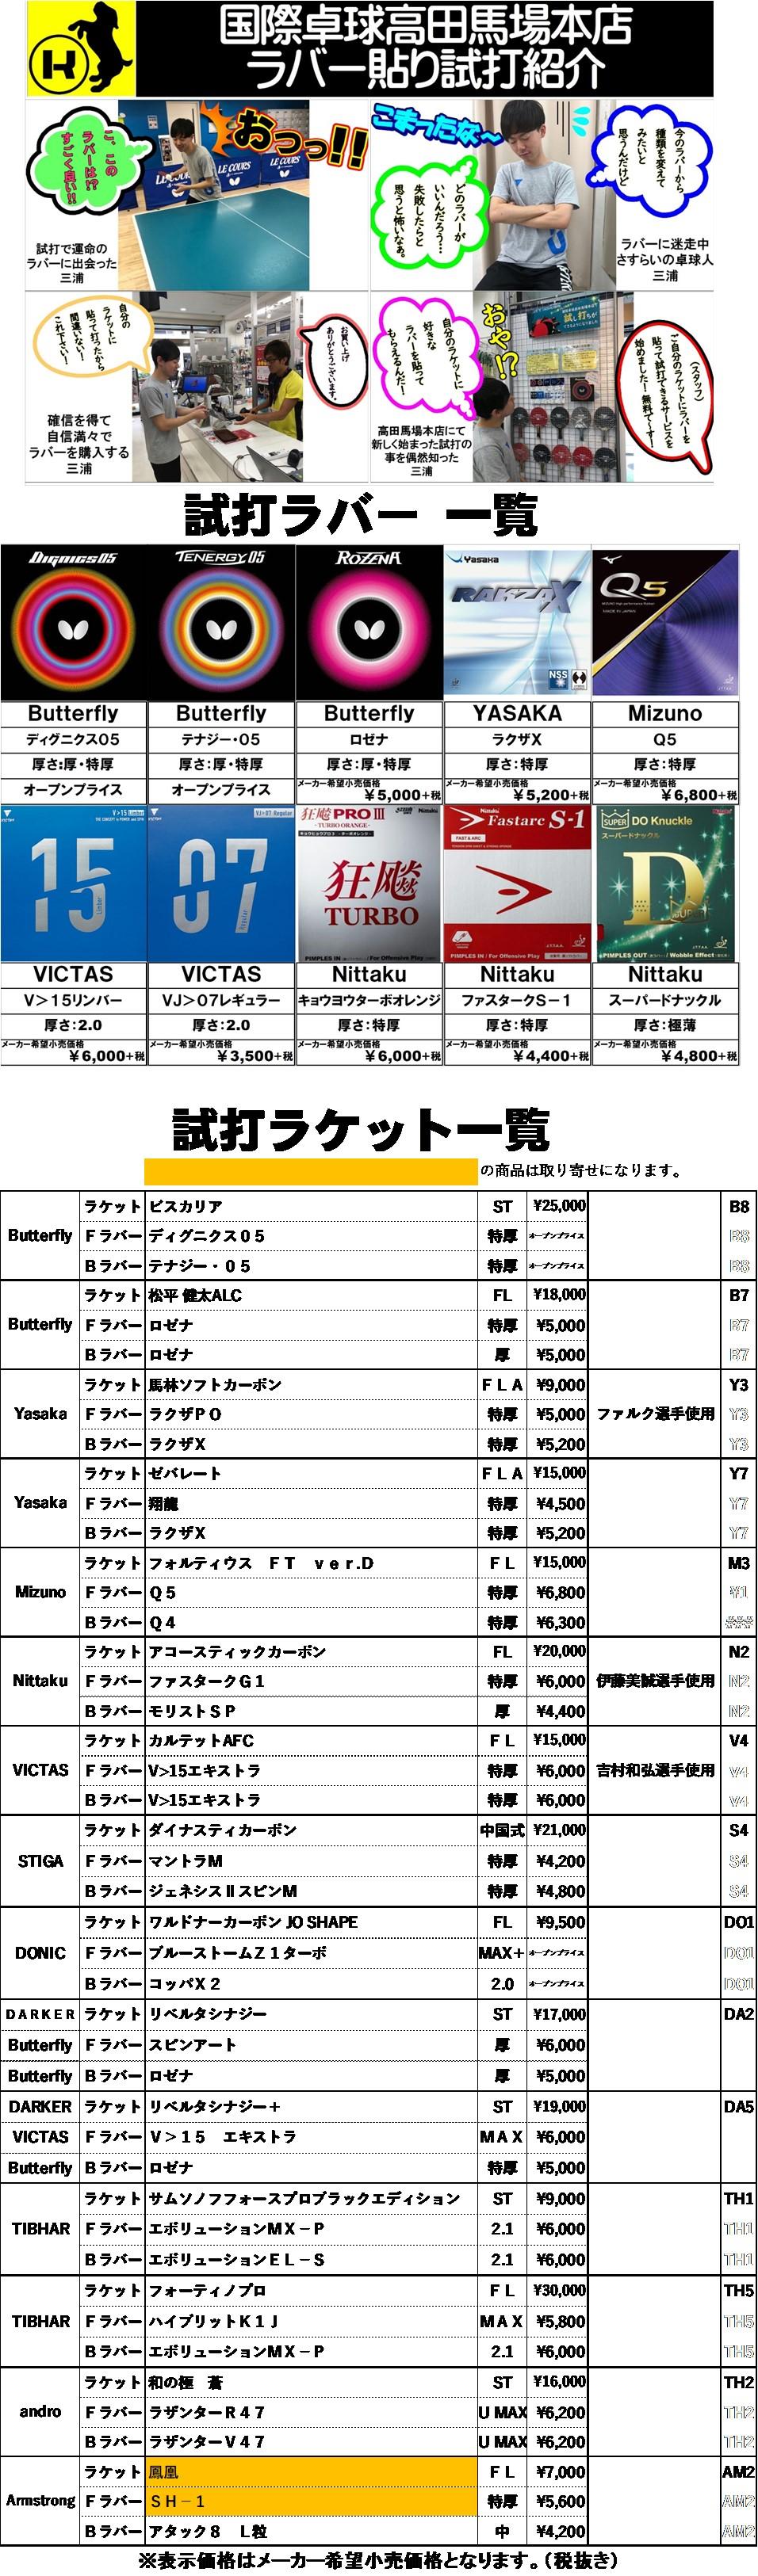 2019高田馬場店|試打会リスト